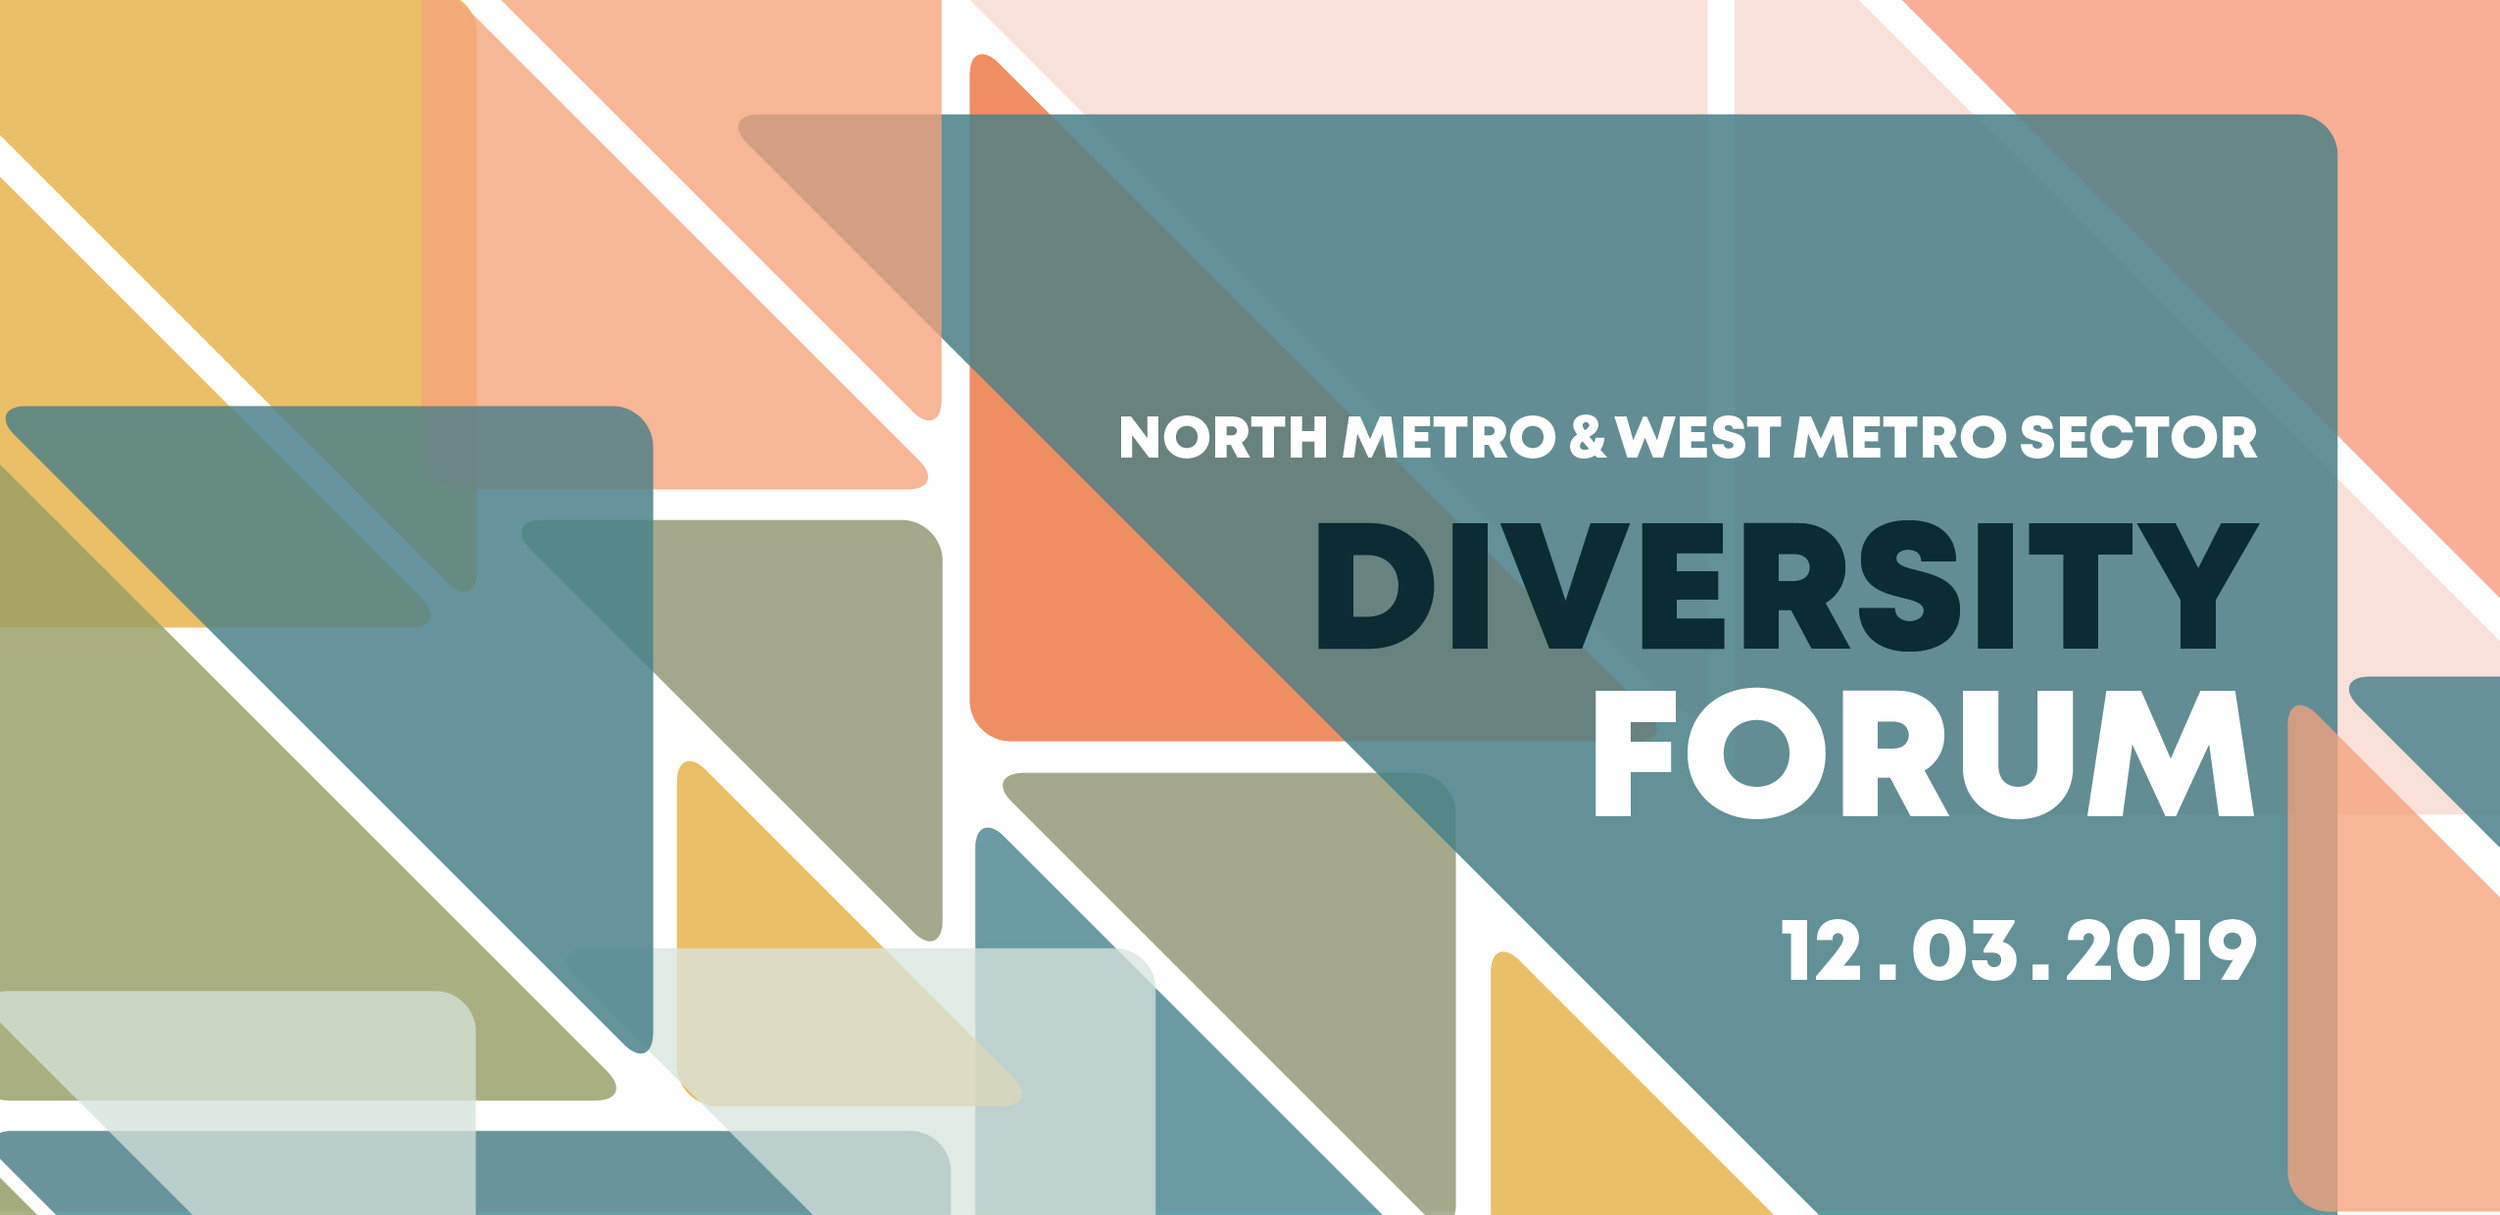 Diversity Forum Banner.jpg